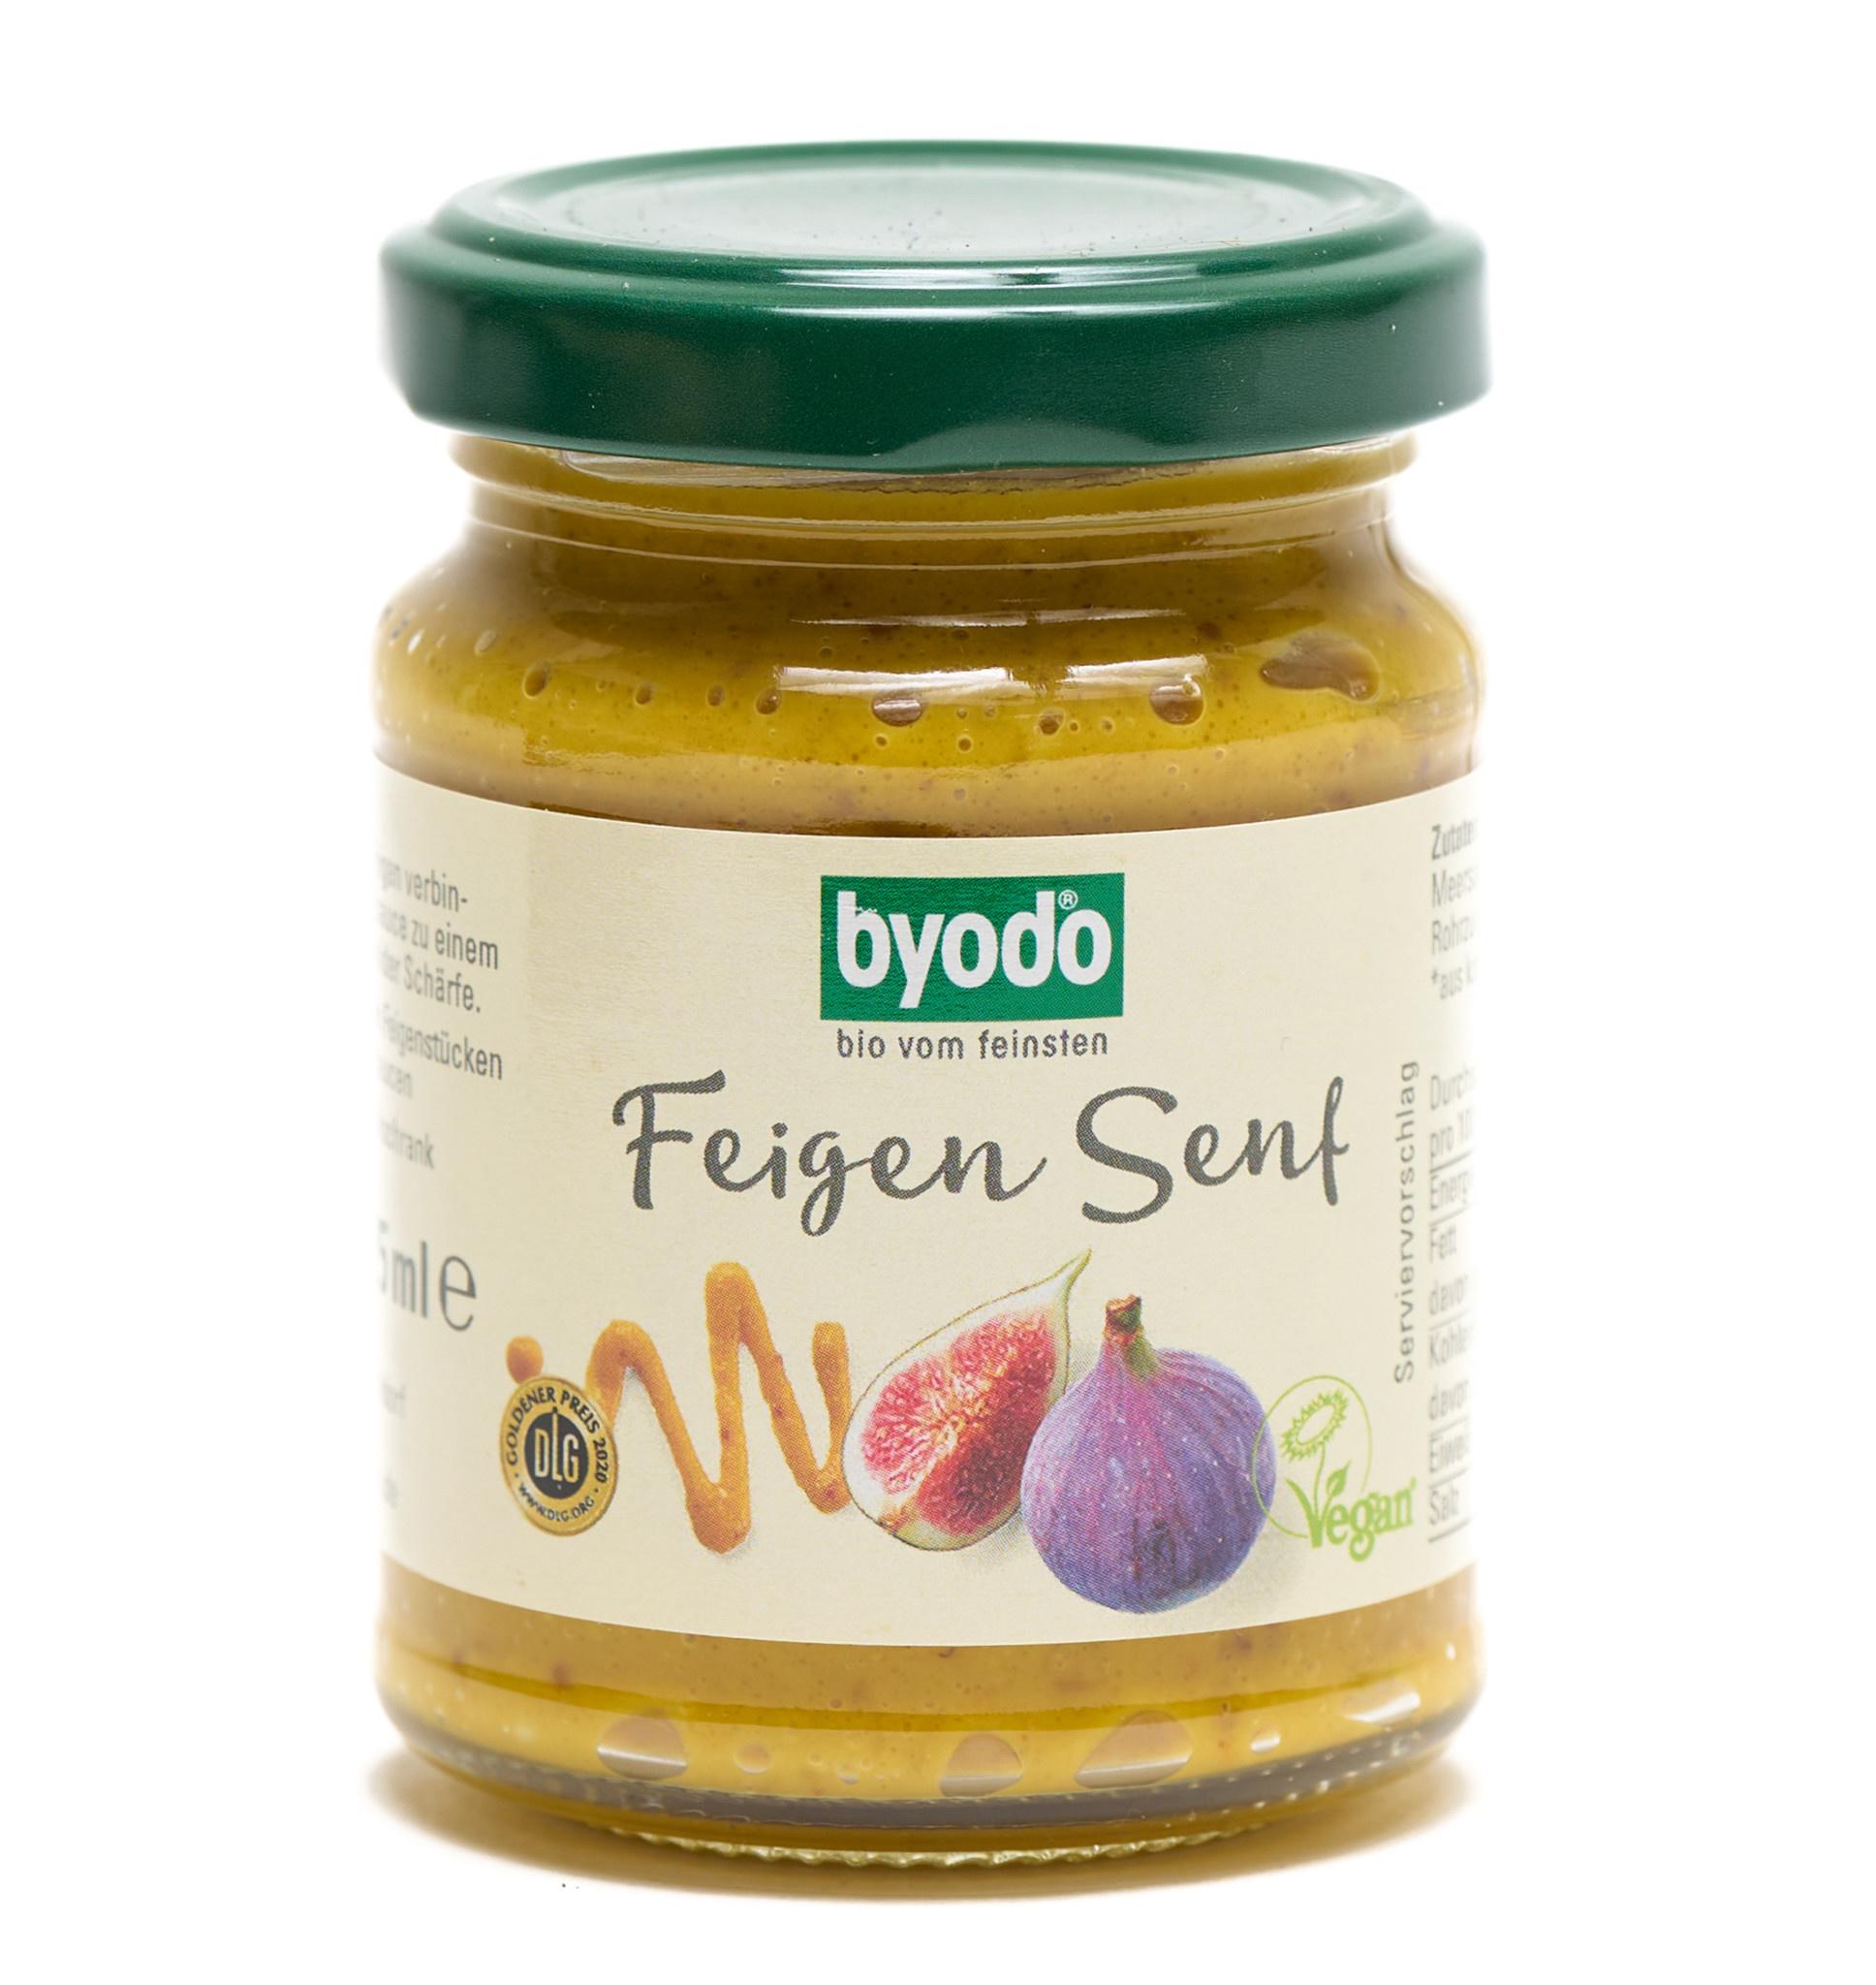 BYODO BYODO Organic Fruity Mustard with 20% figs & fine mustard note